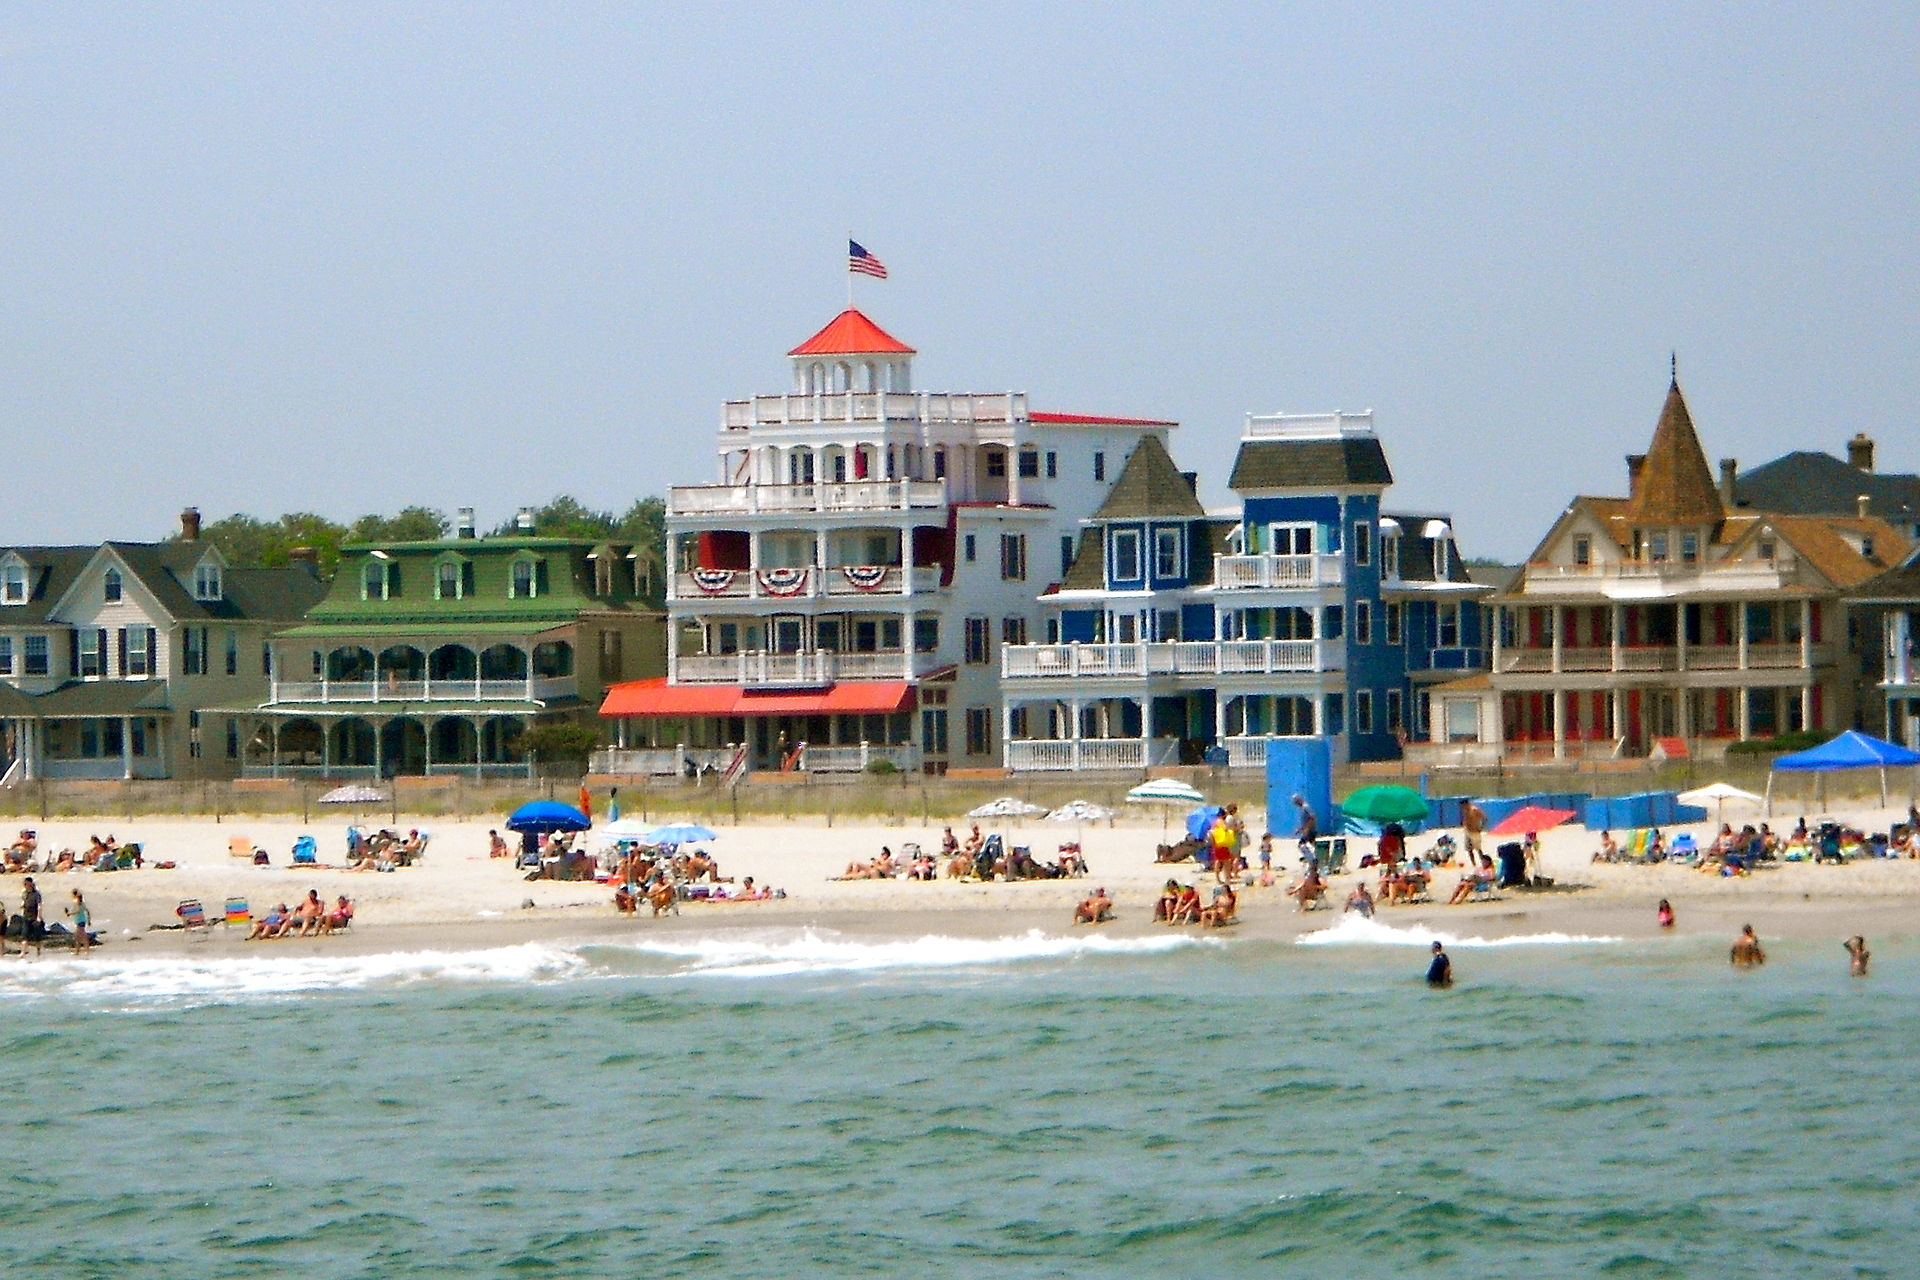 Cape May Island Resort